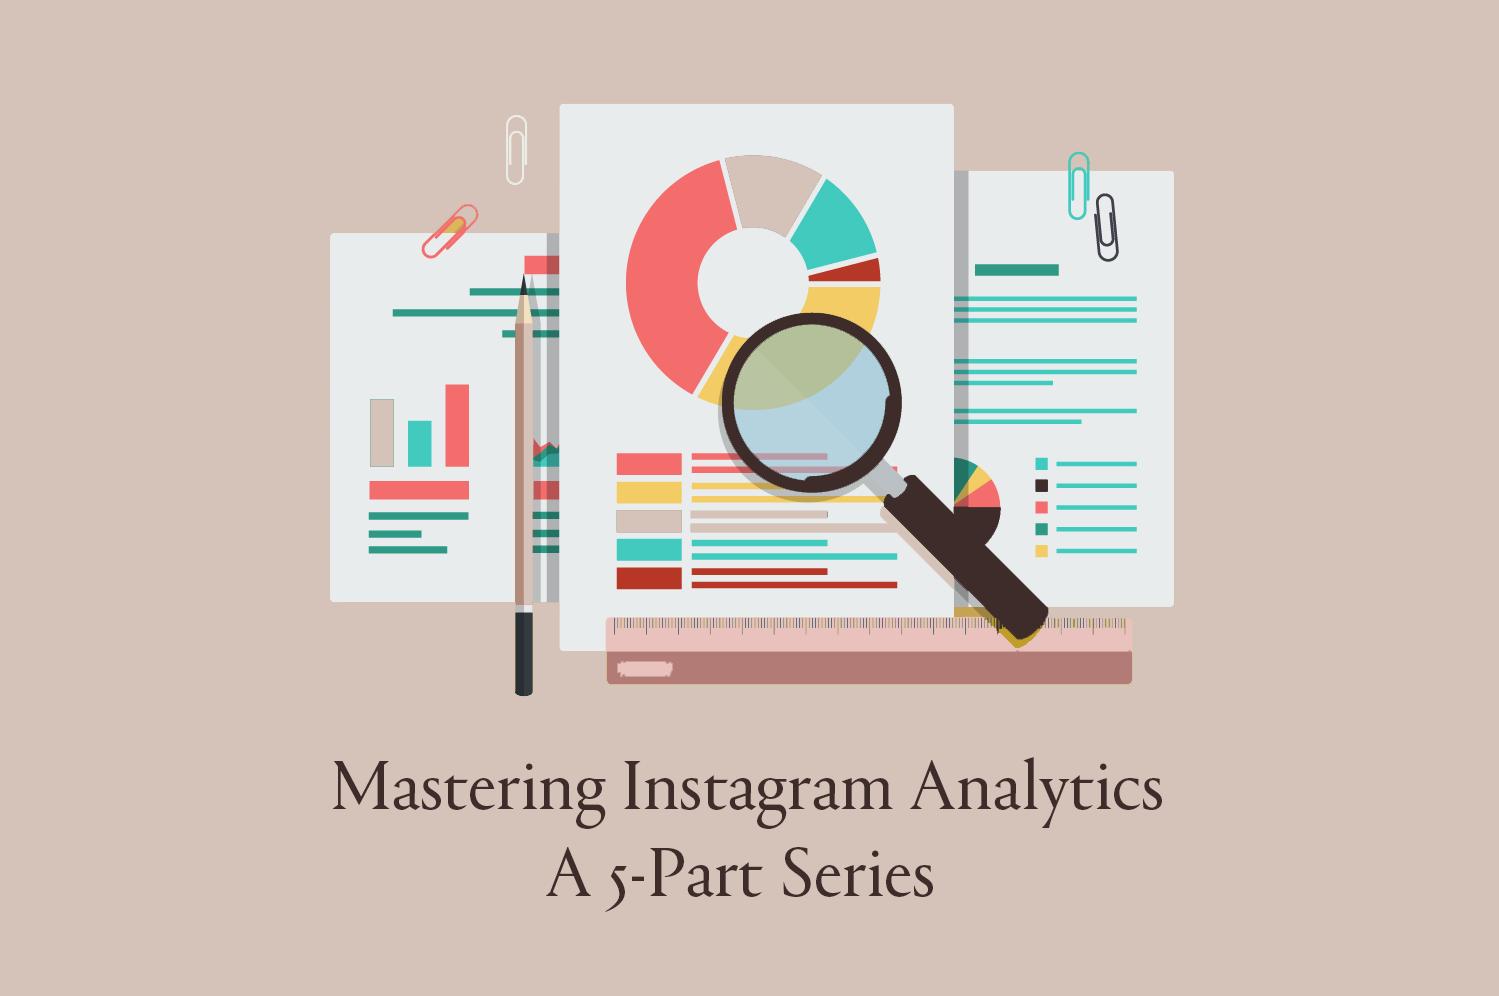 instragram-analytics-blog-cover.png